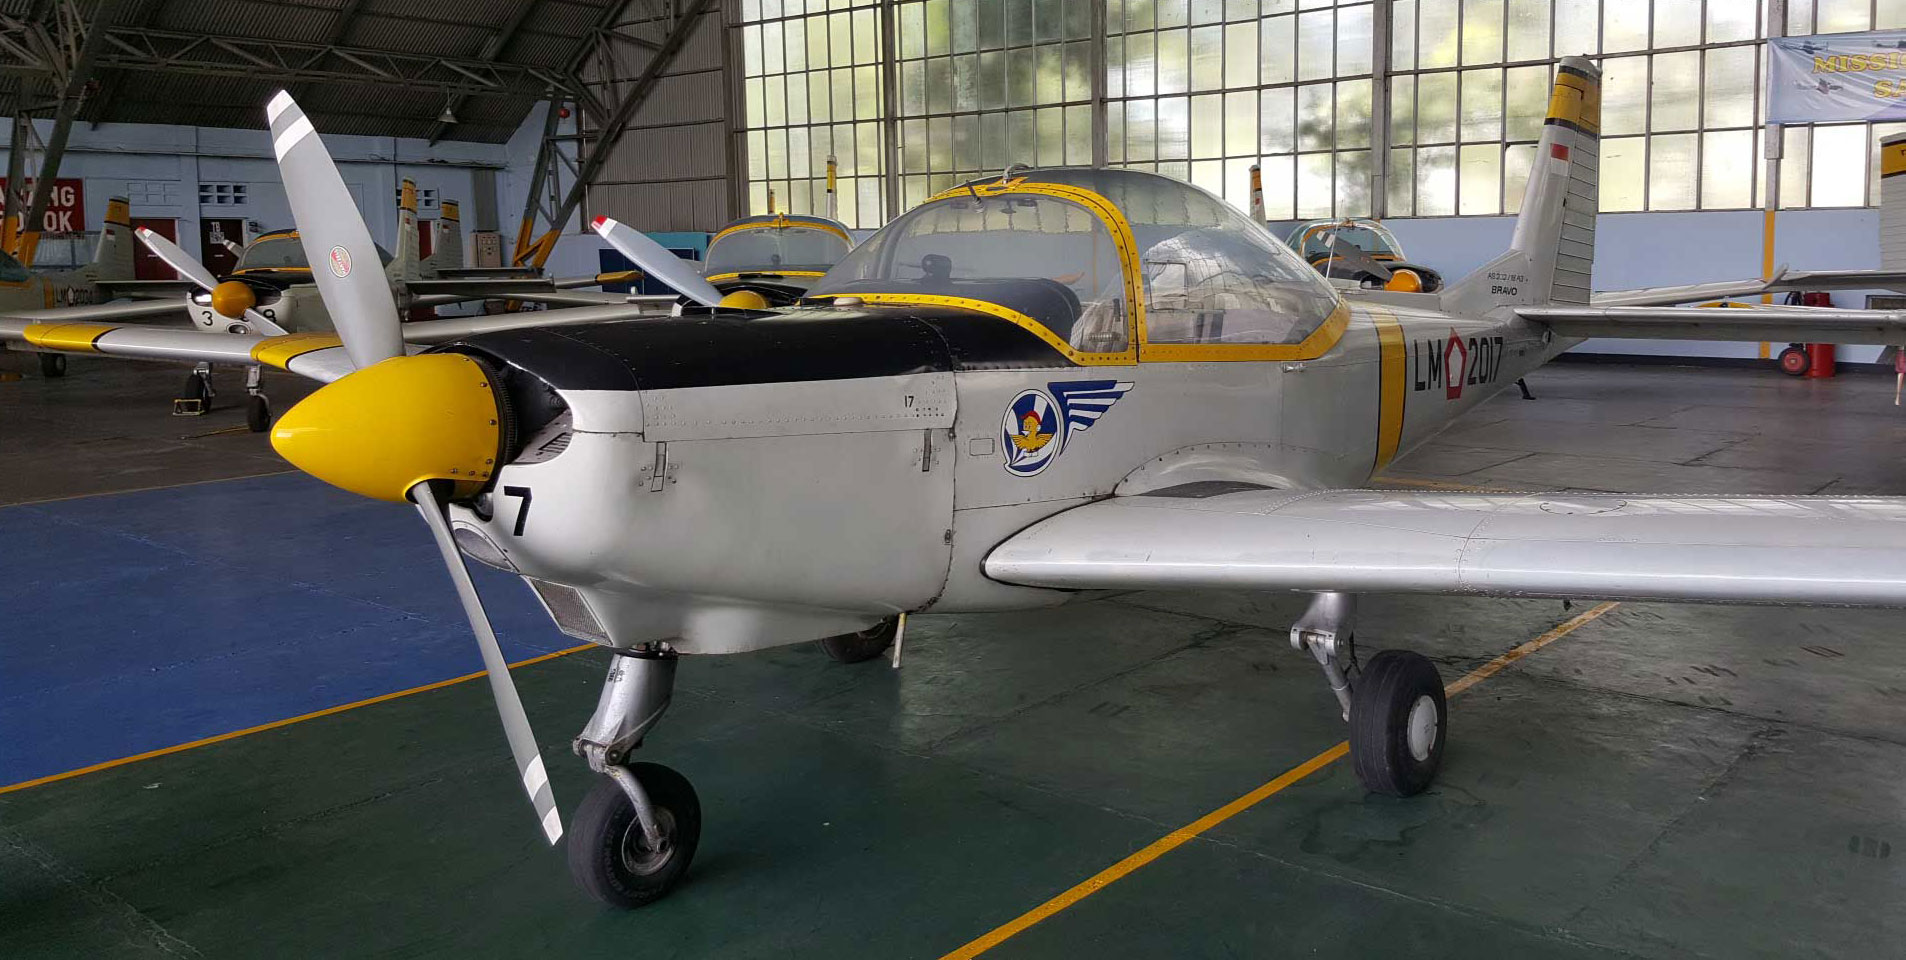 Mengenang Pesawat Latih Dasar AS 202 Bravo